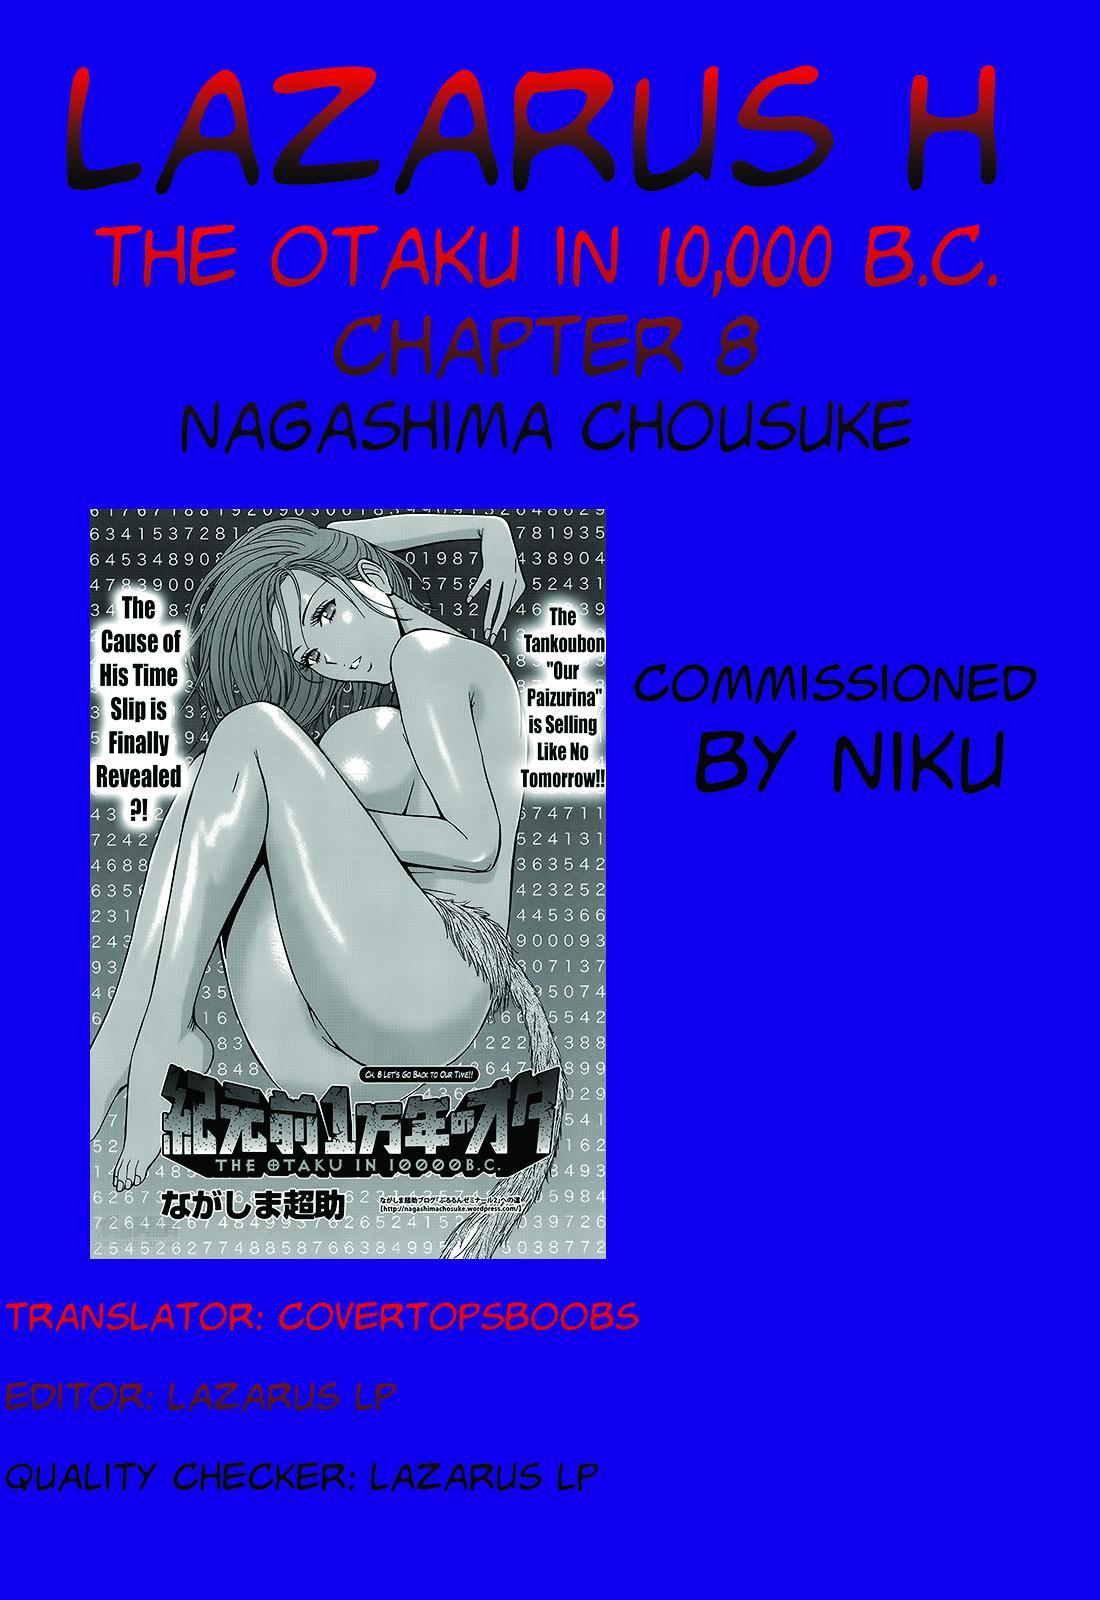 Kigenzen 10000 Nen no Ota | The Otaku in 10,000 B.C. 155